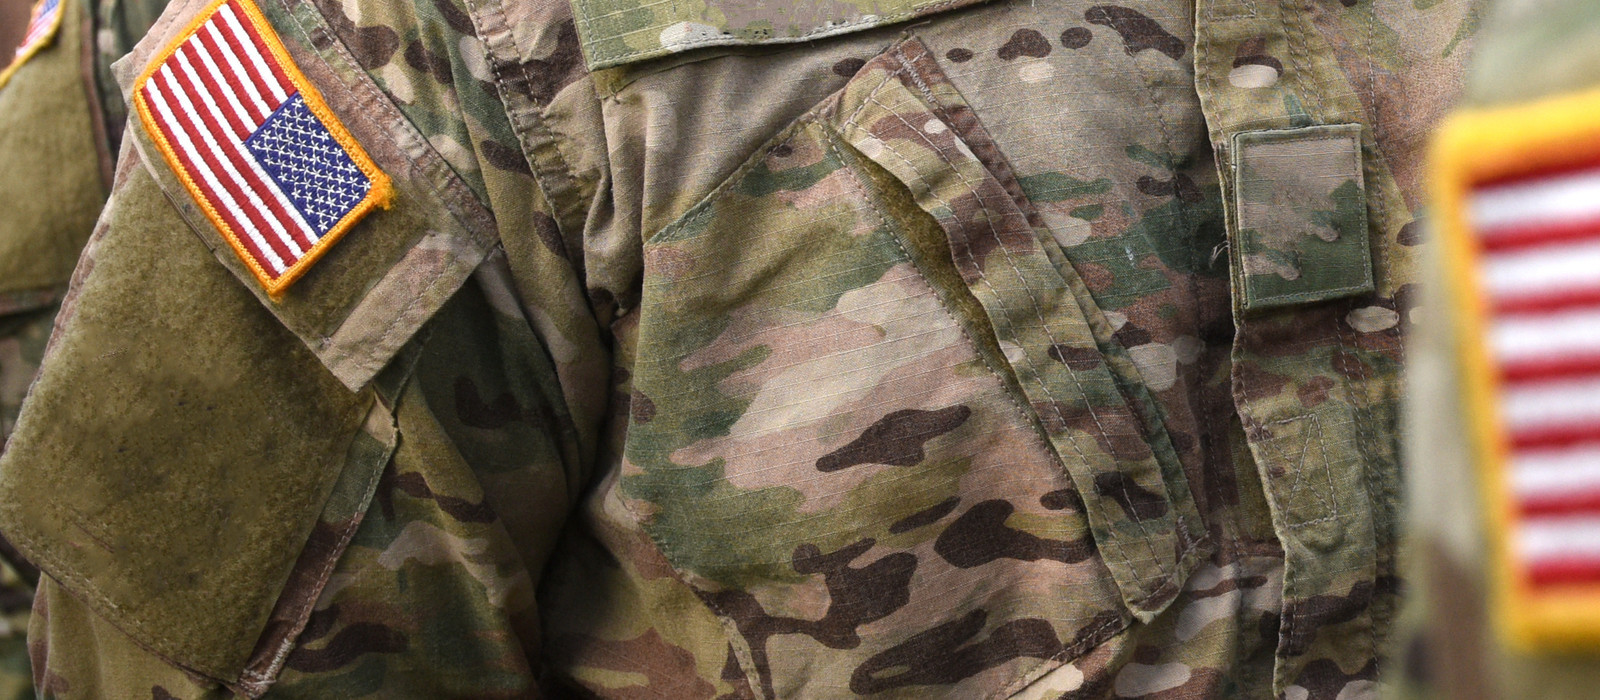 Military Group Appreciation Uniform | Westgate New York Grand Central